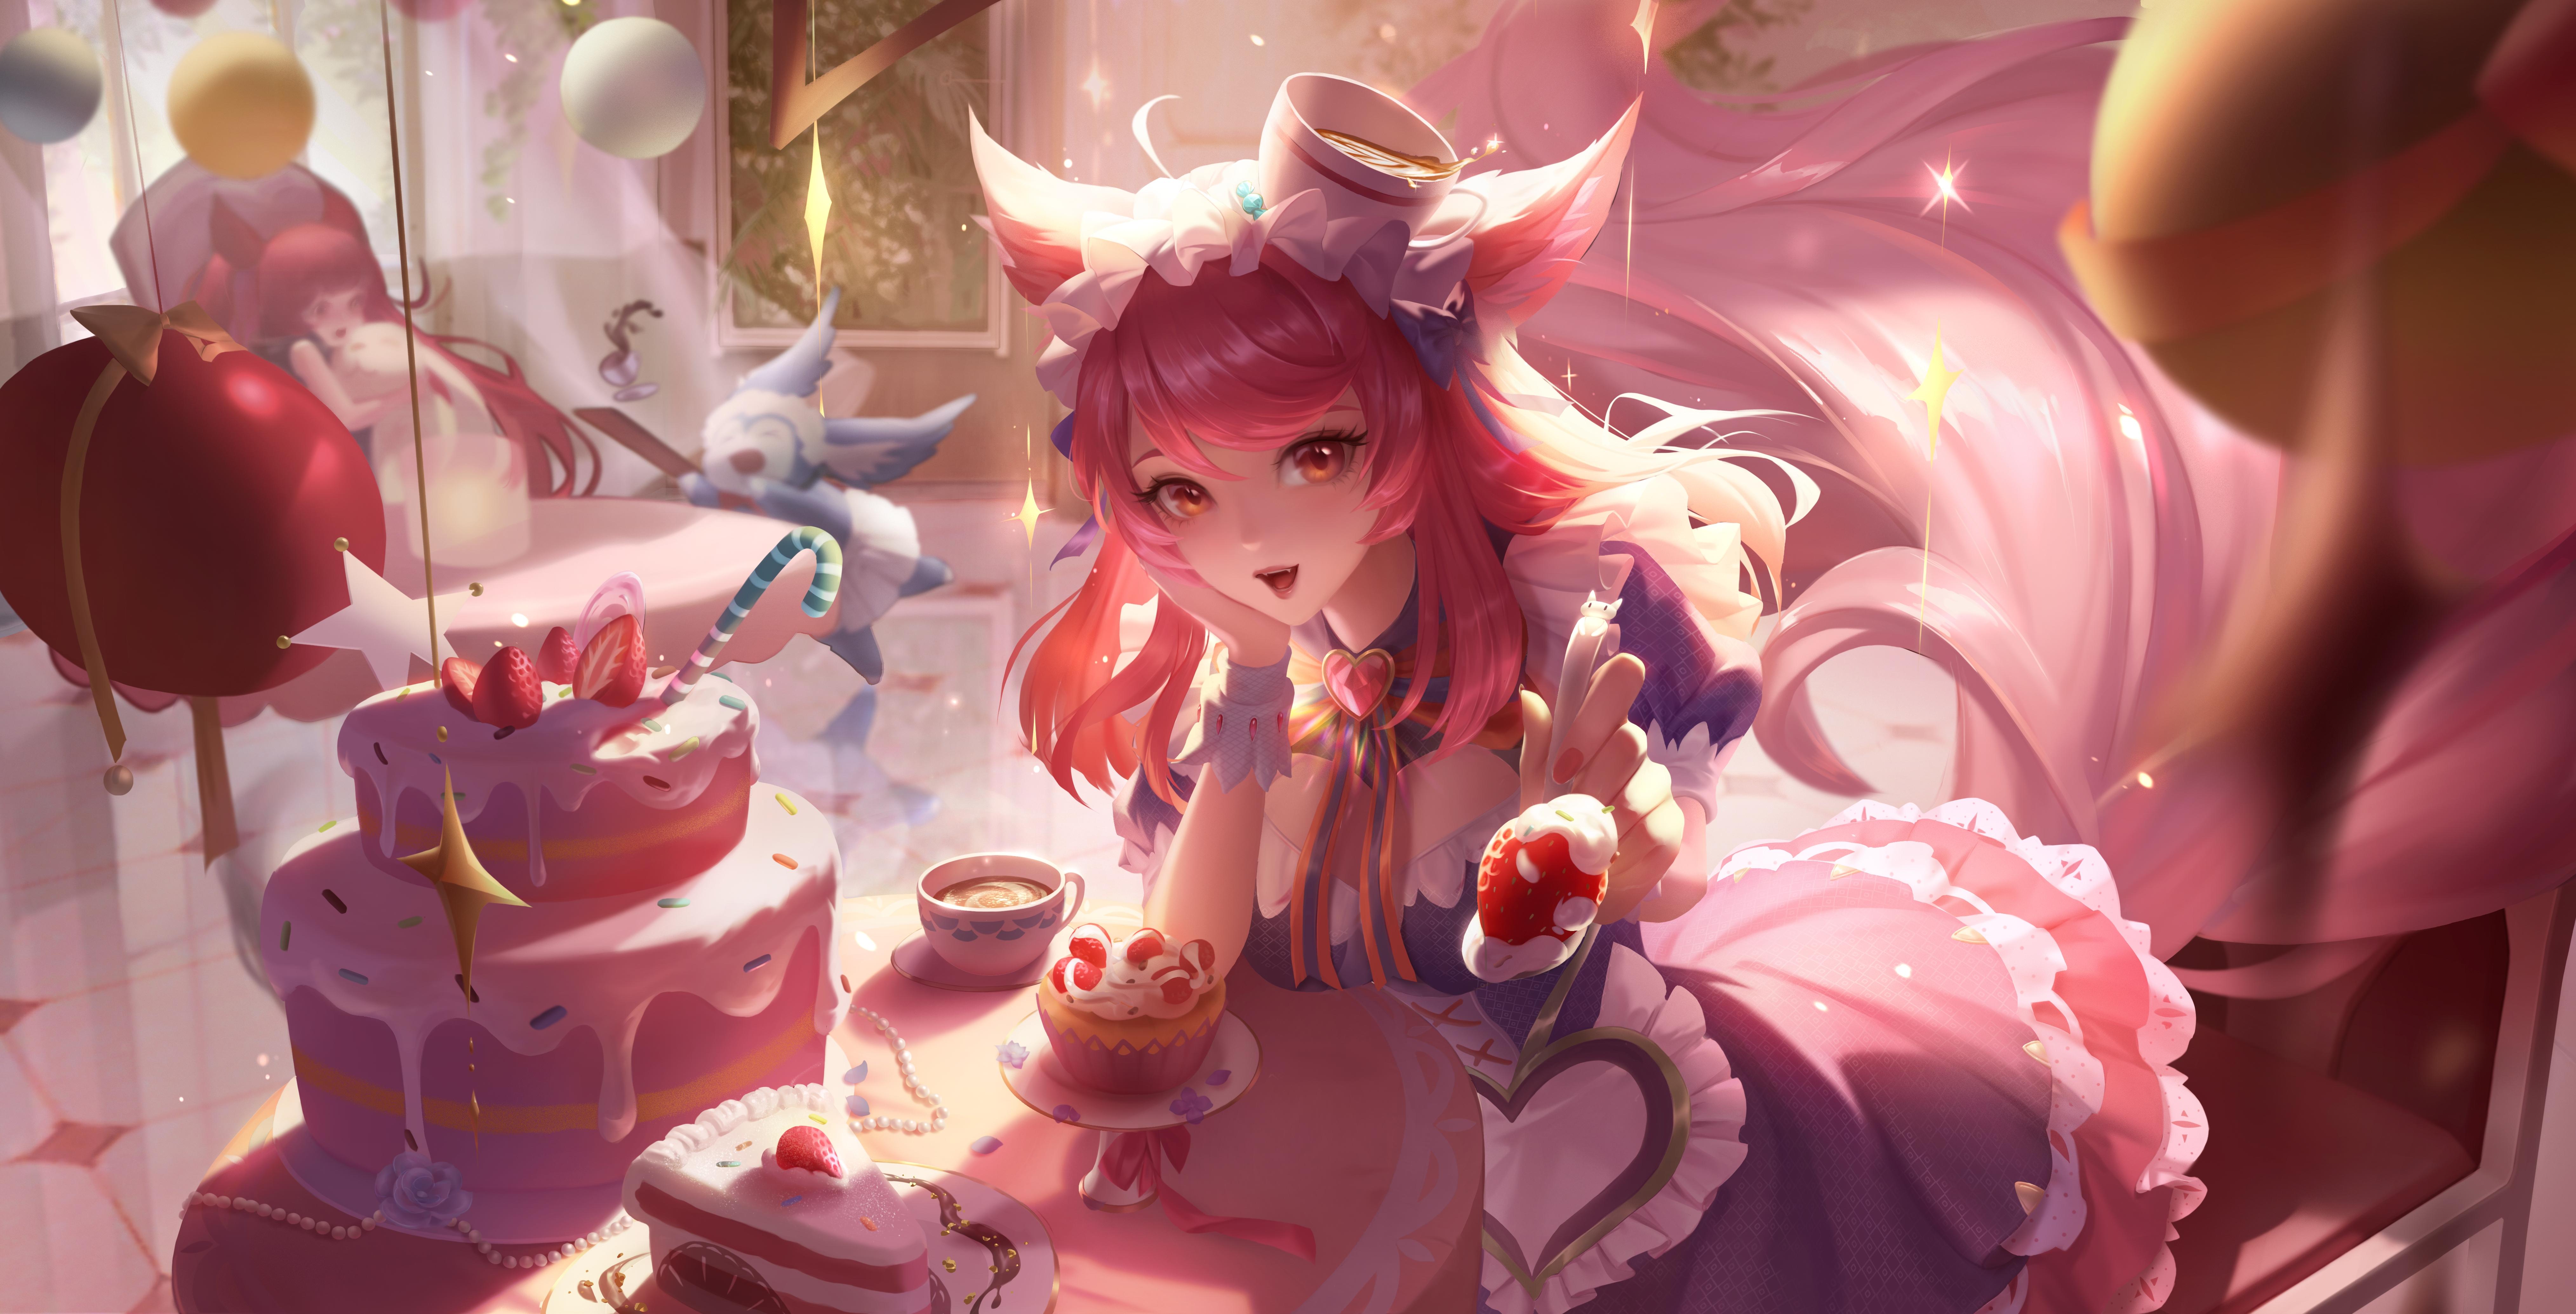 Anime 8114x4138 Honor of Kings Da Ji(Honor of Kings) maid coffee cake anime girls 3Q Studio animal ears tail redhead brown eyes